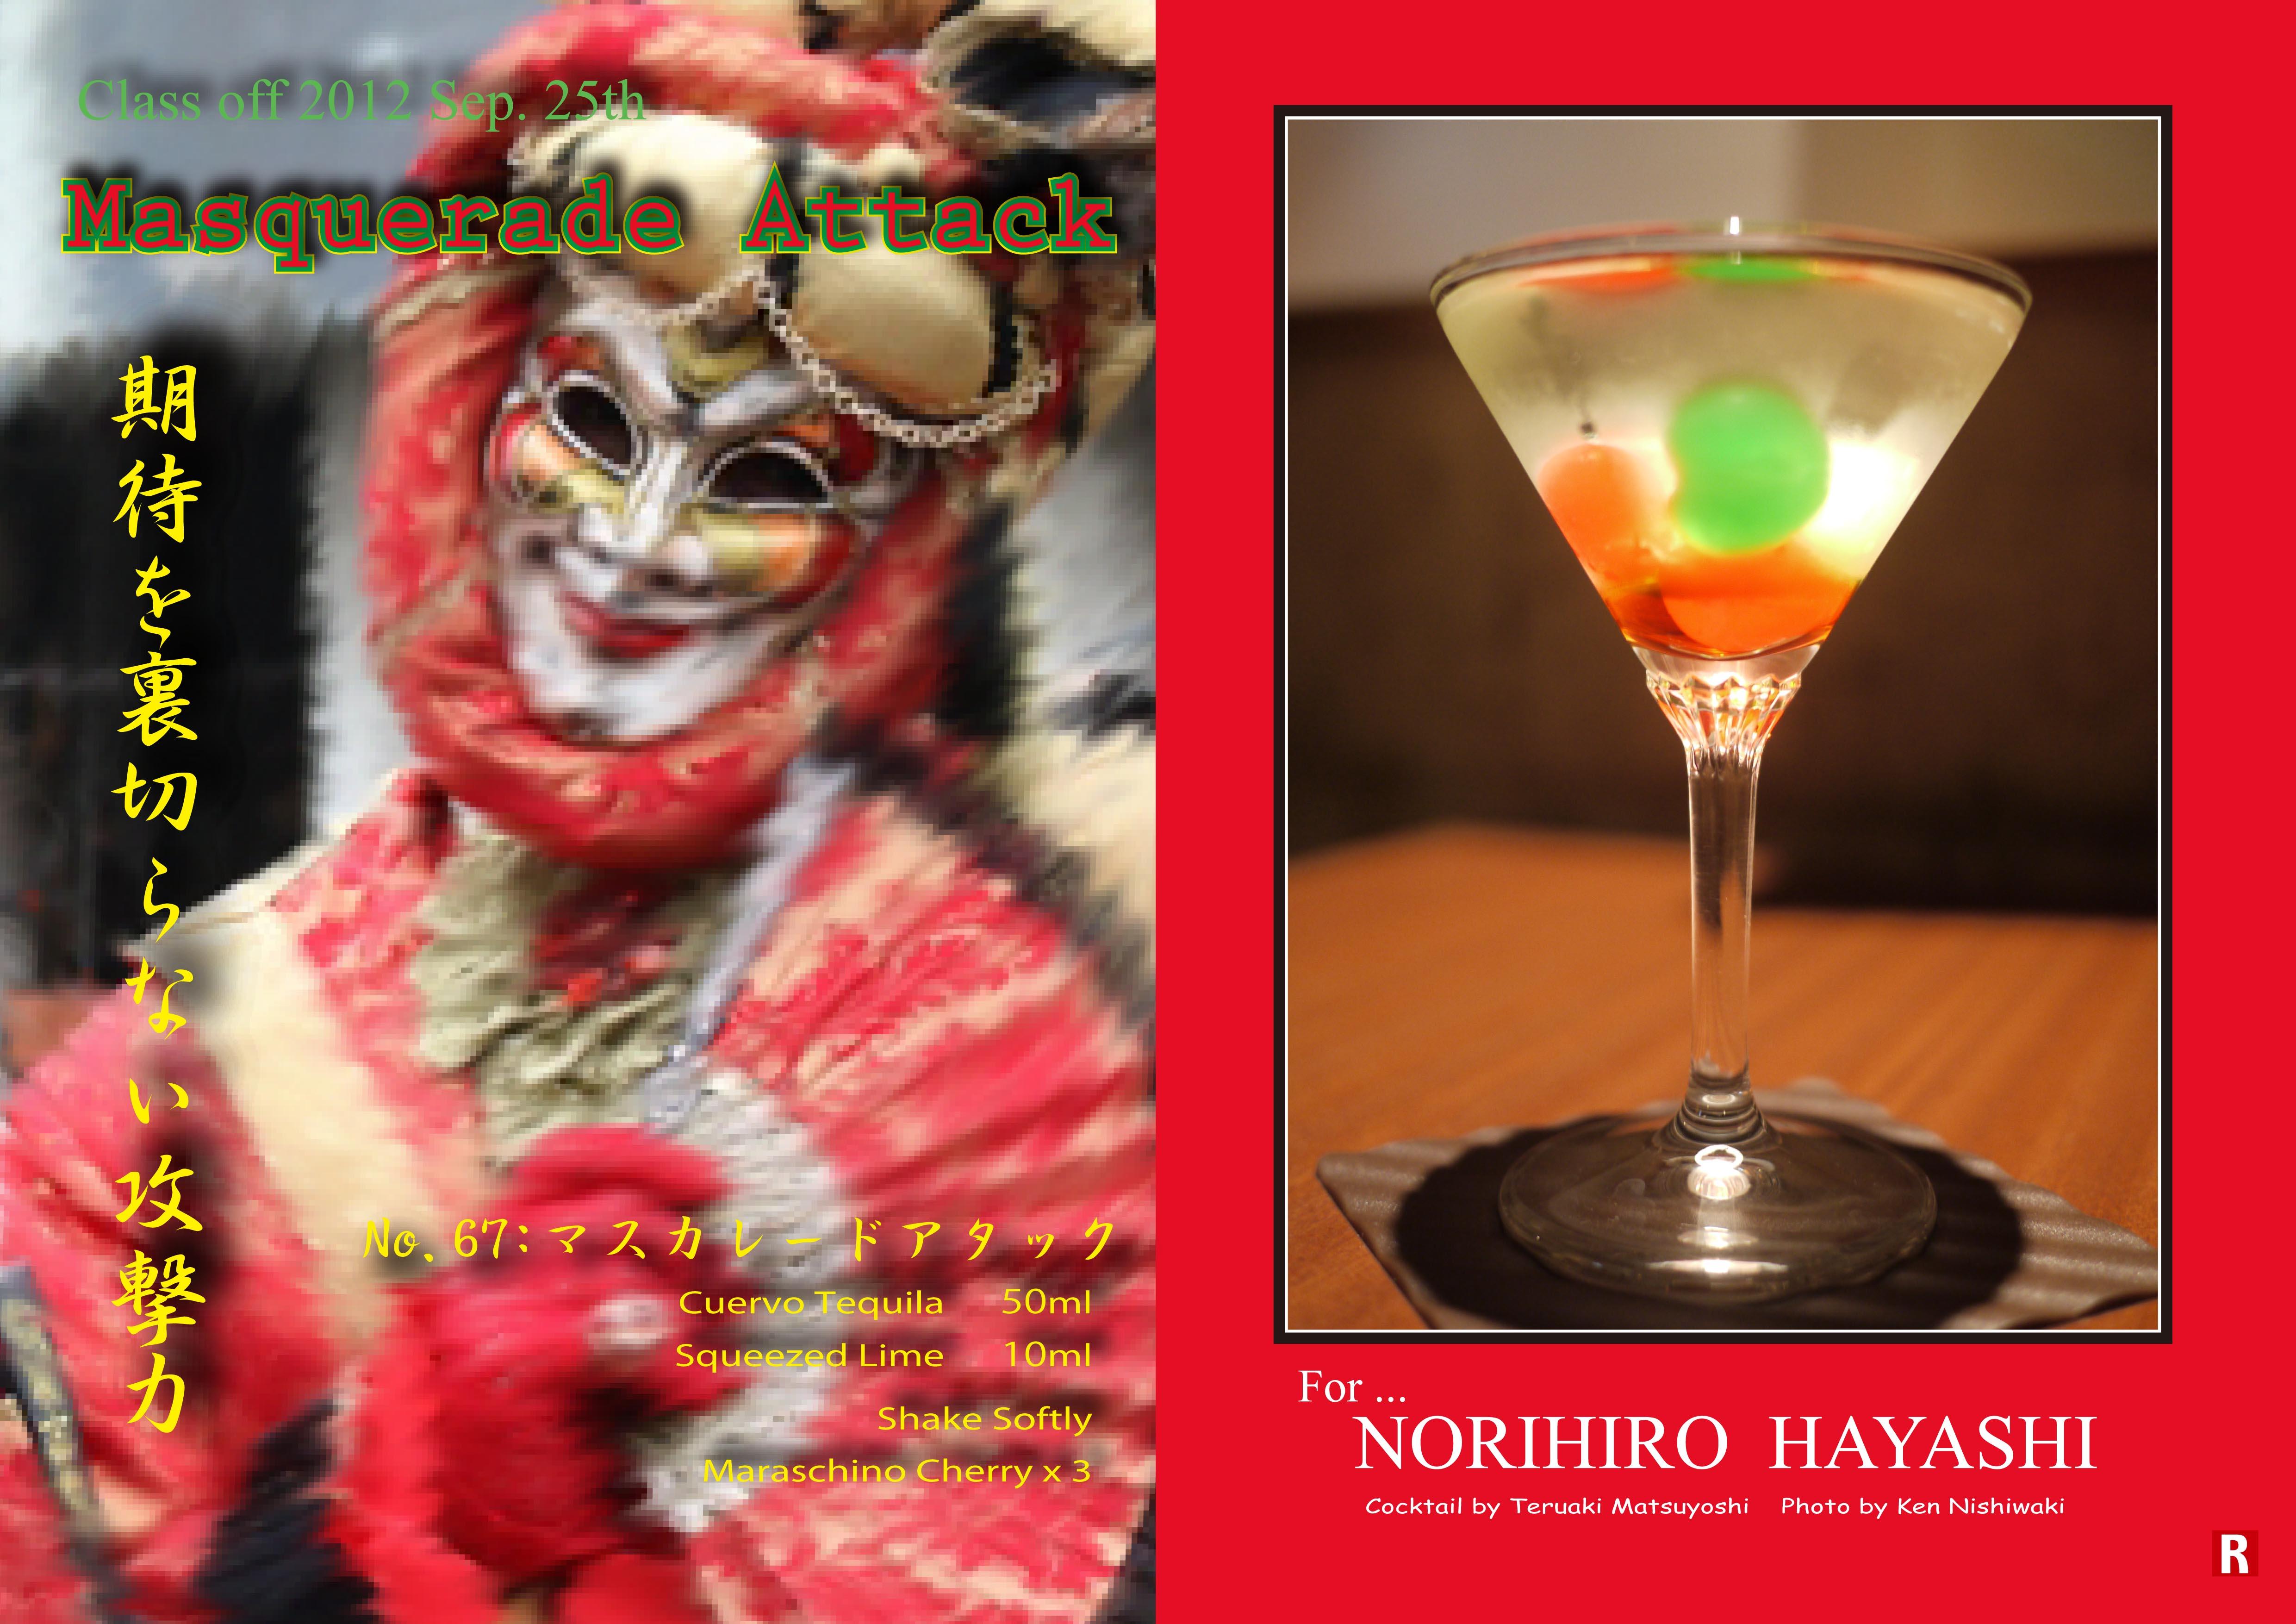 201209Norihiro-Hayashi_Masquerade-Attack